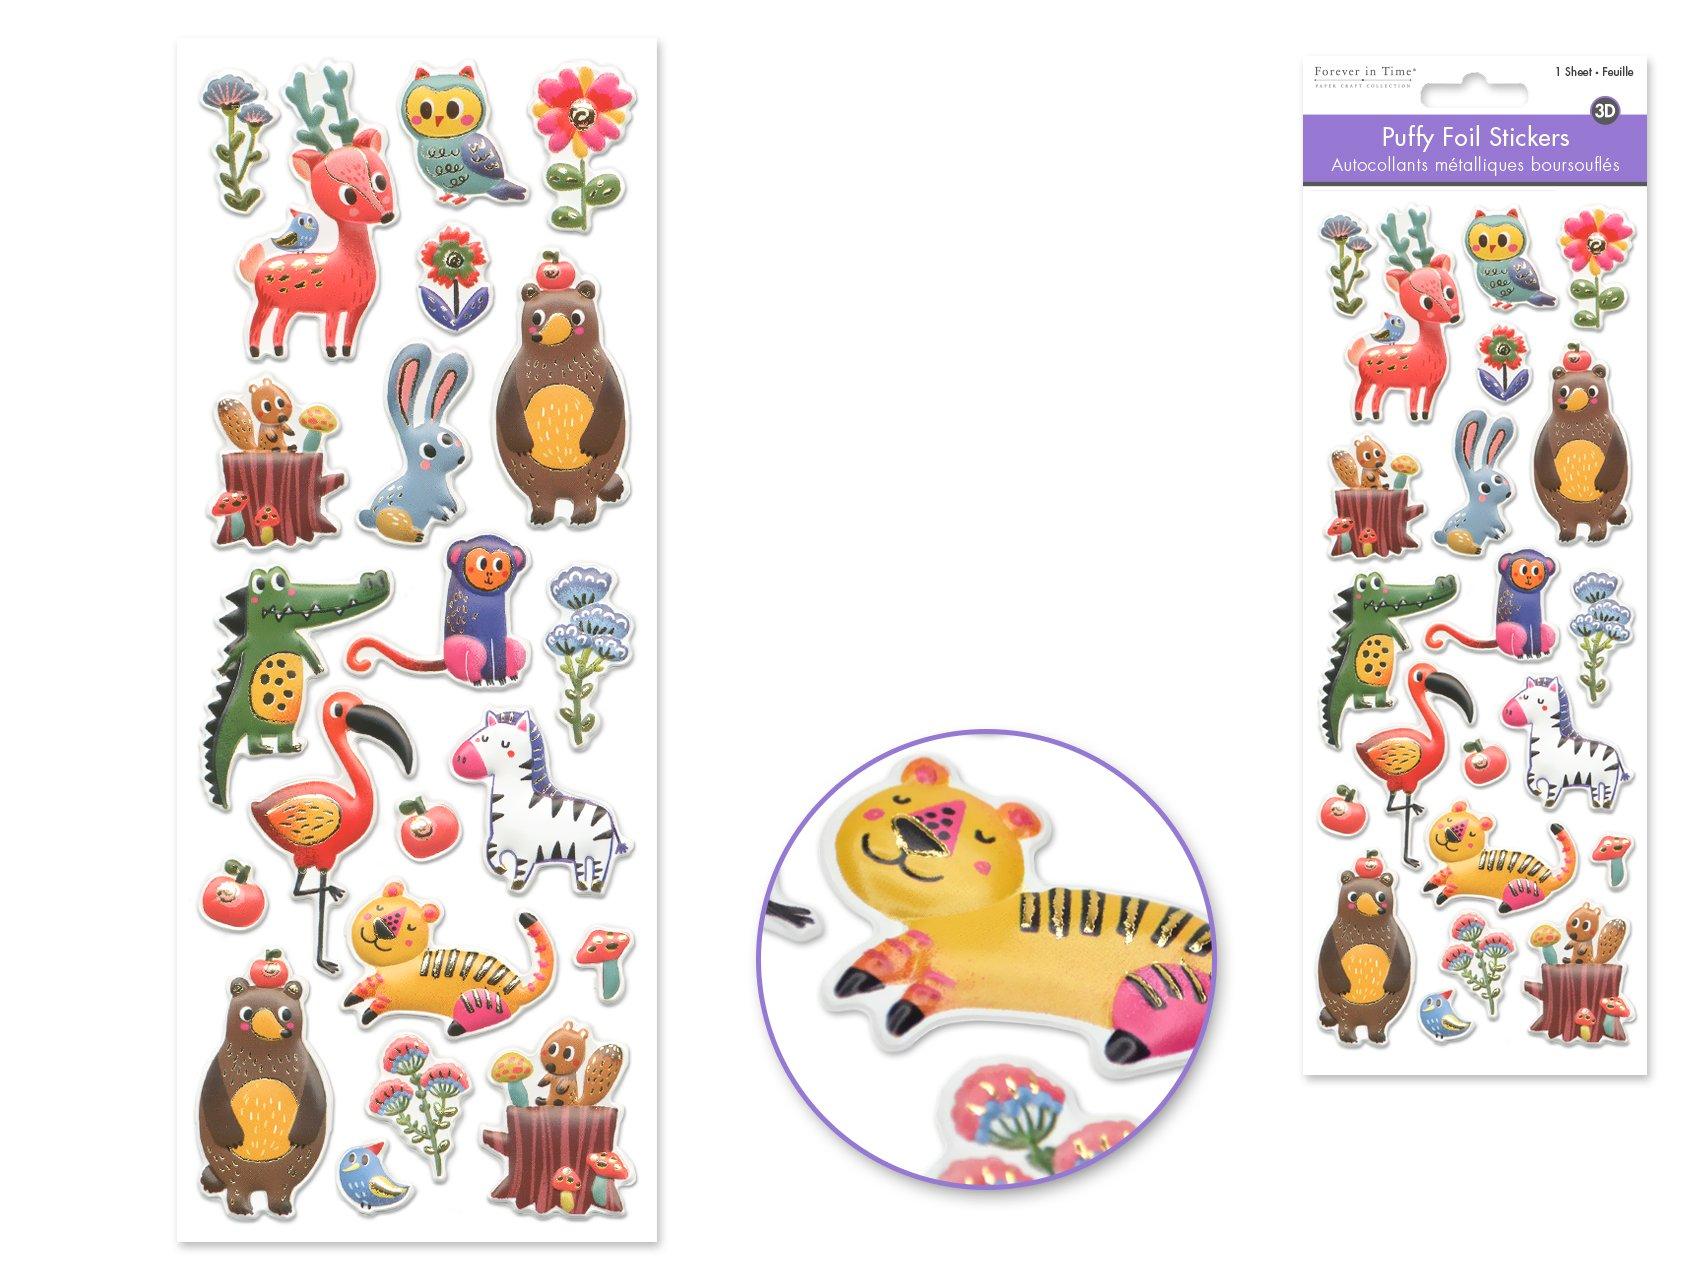 Puffy Foil Stickers-Wild ANimals